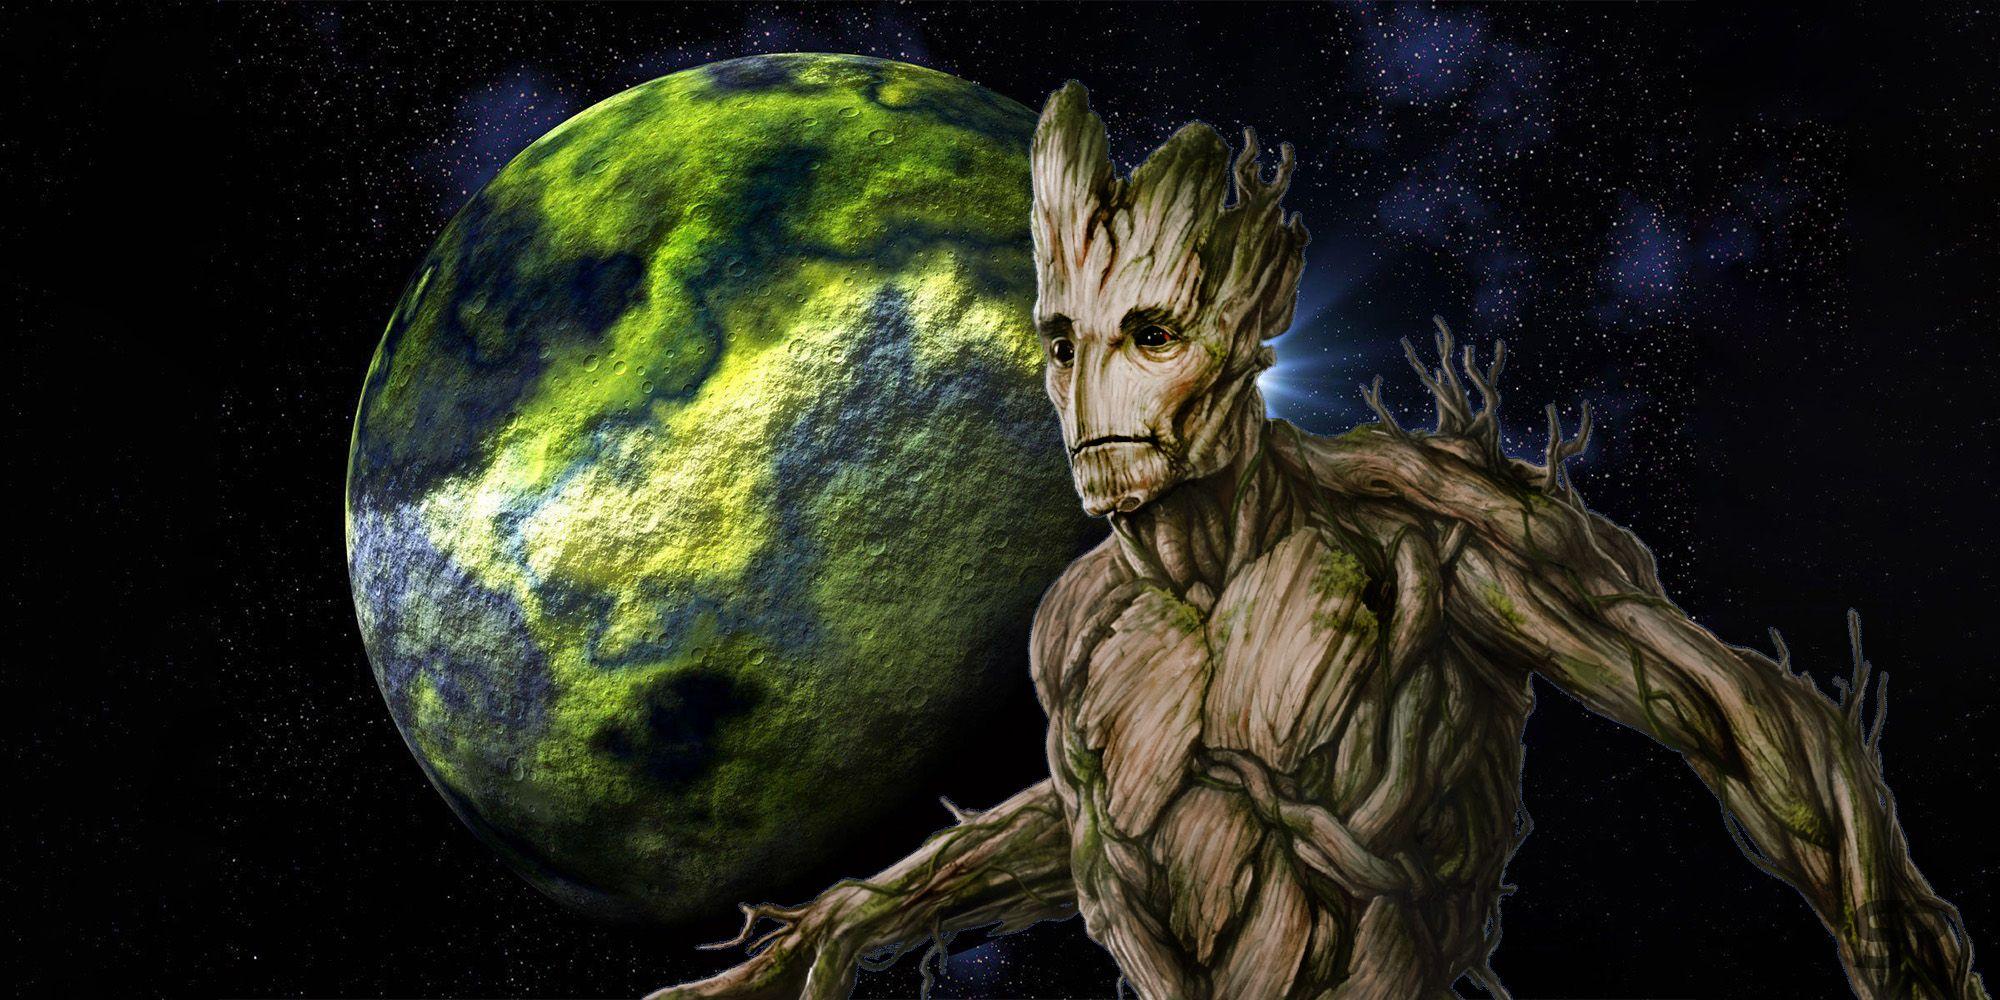 Groot Is Returning To His Homeworld Planet X In The MCU Teases Vin Diesel